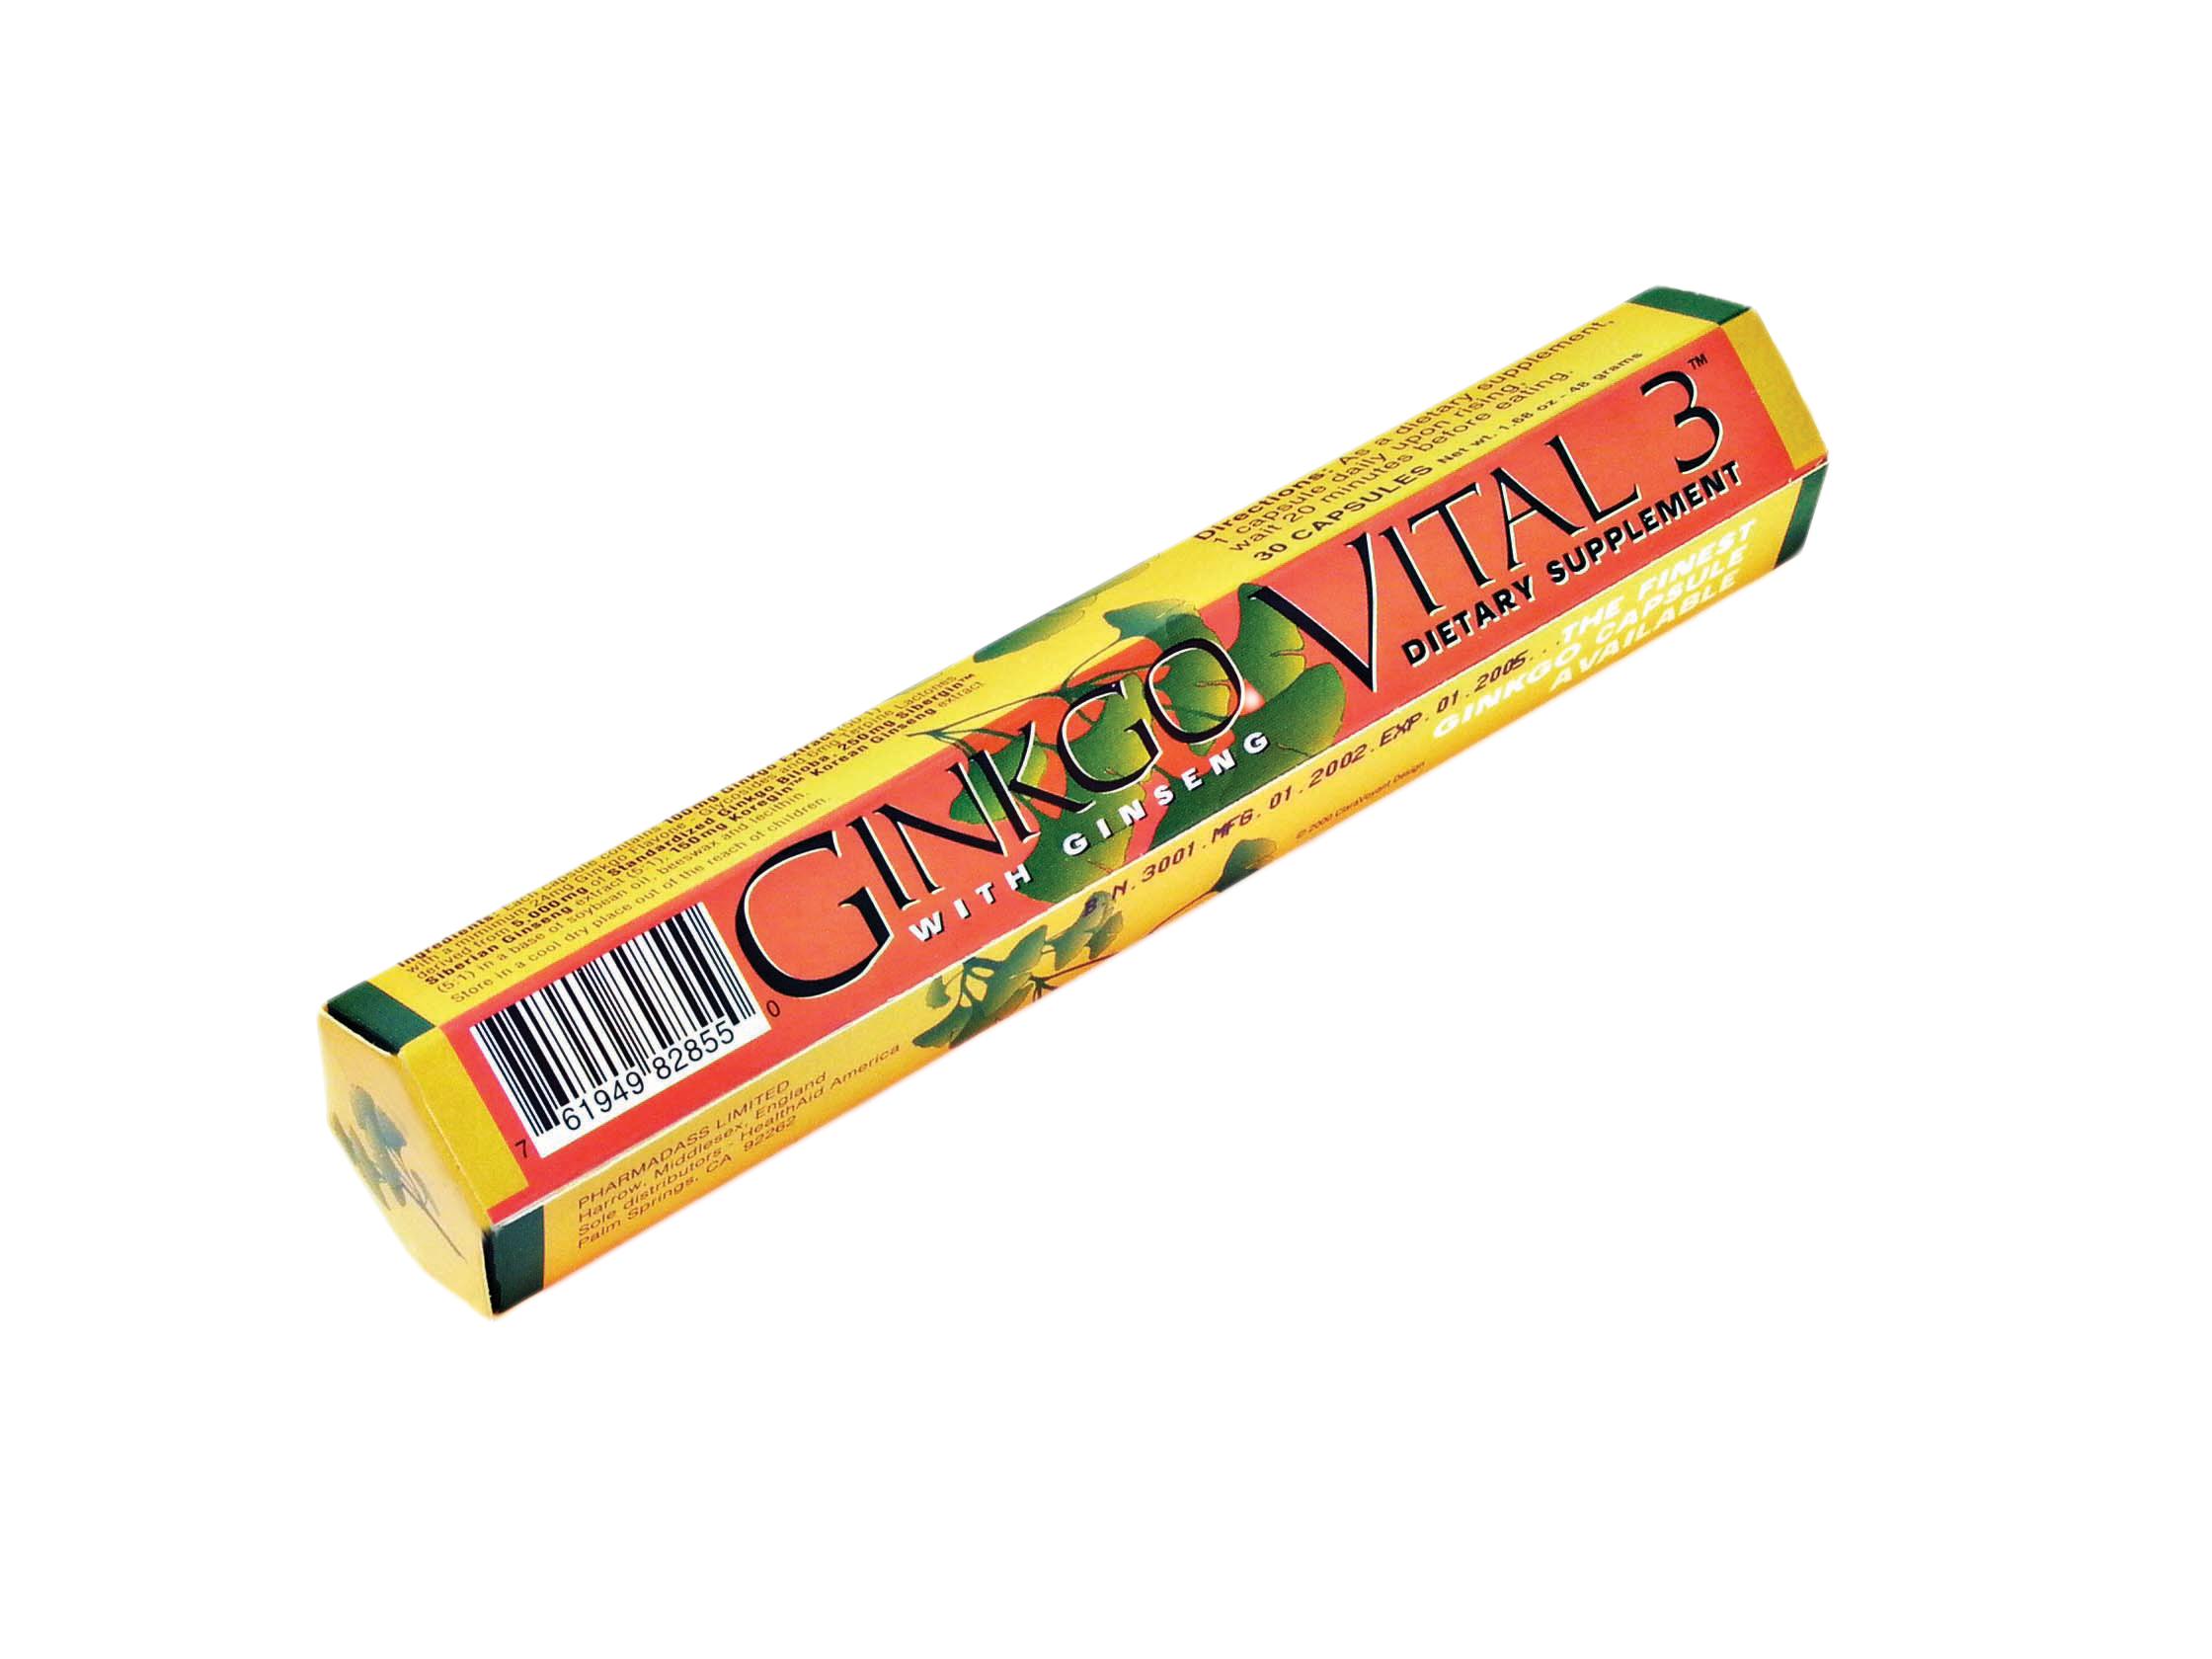 Ginkgo Vital 3 30's